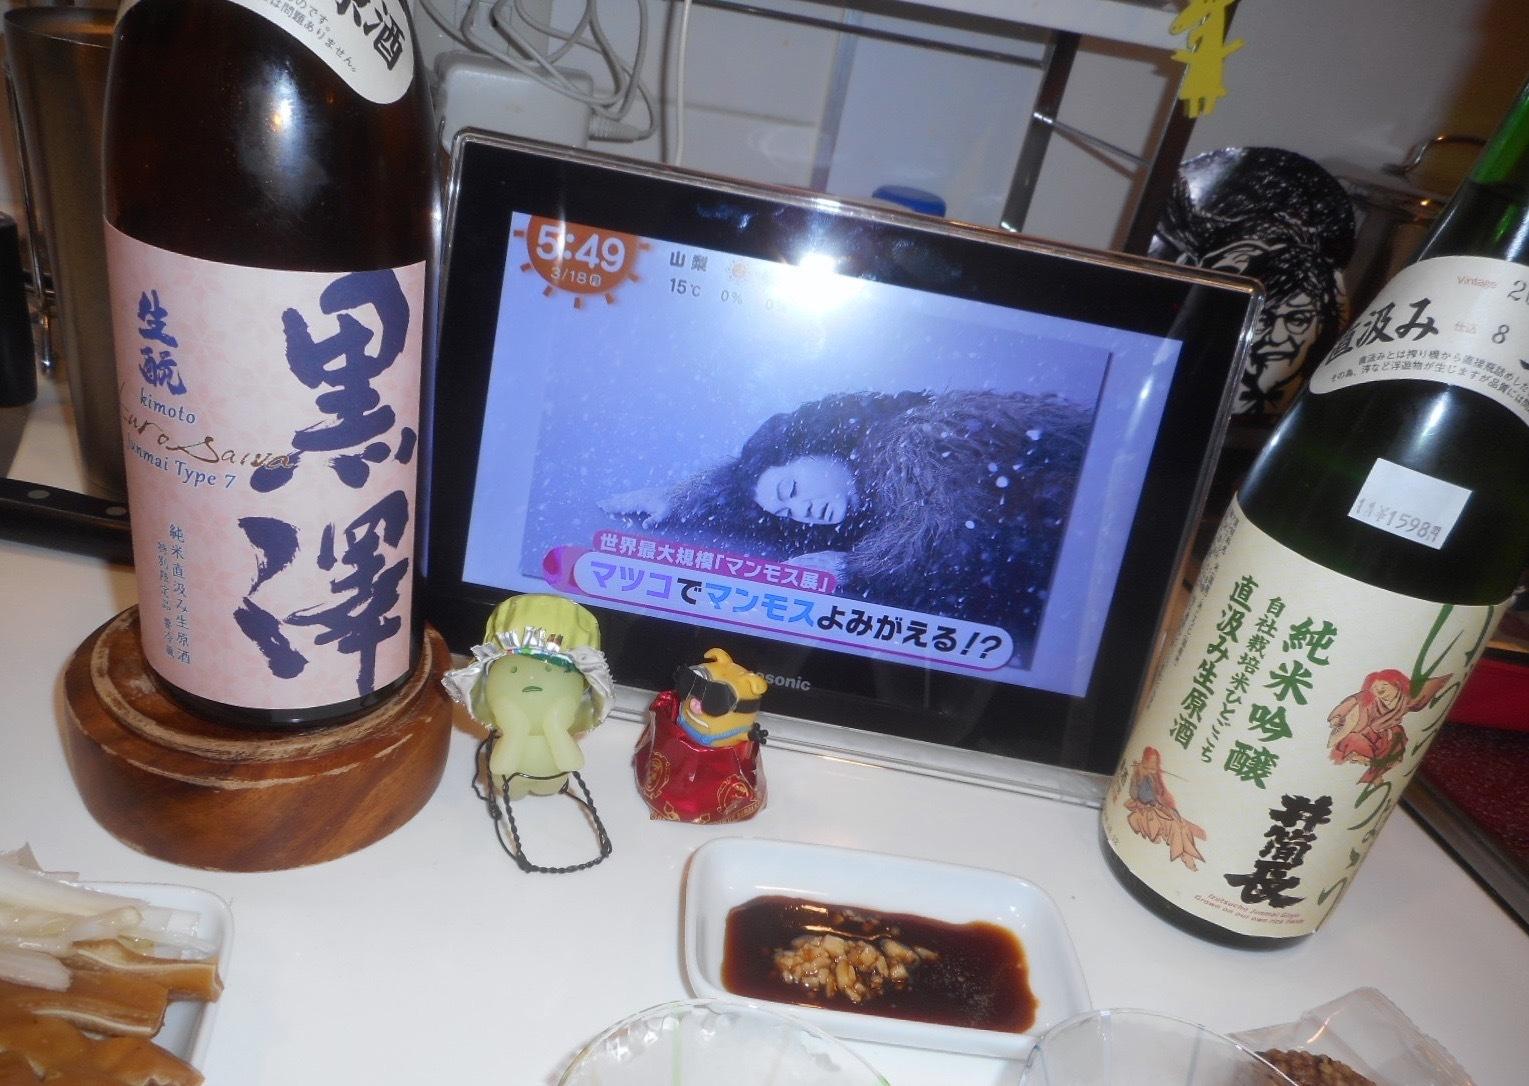 izutsuchou_jikagumi30by2_4.jpg